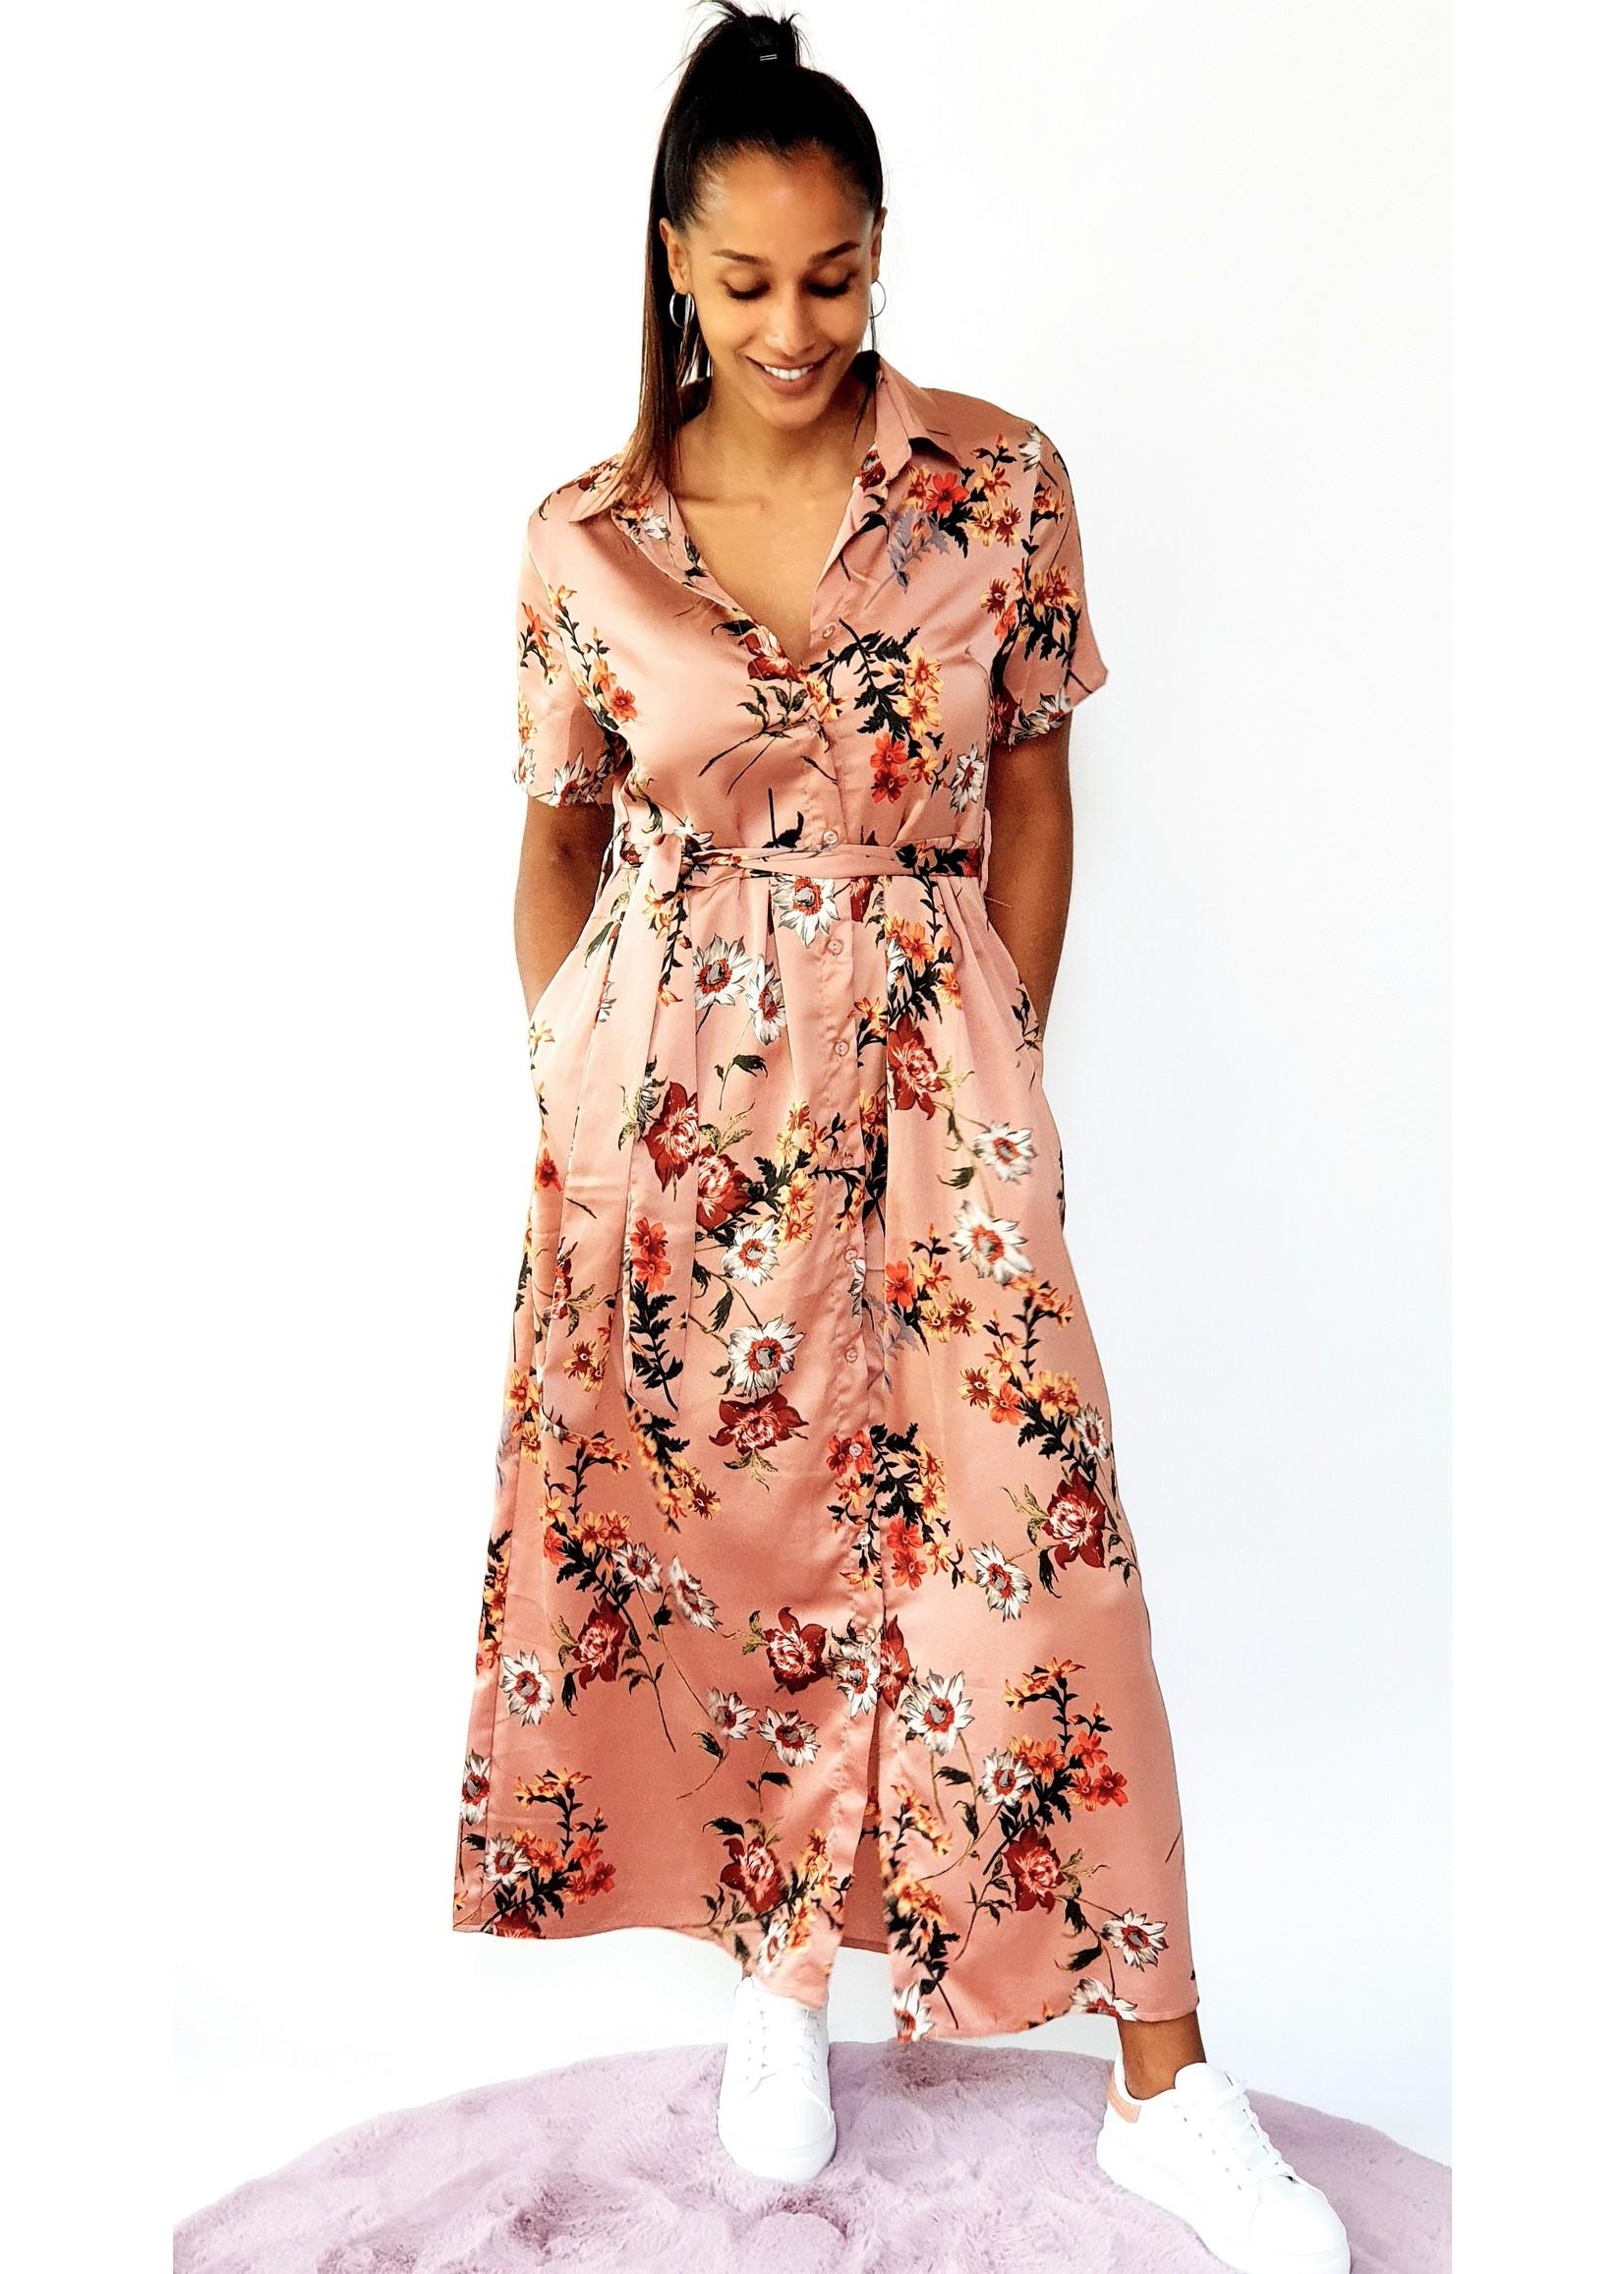 Thé wild flower dress